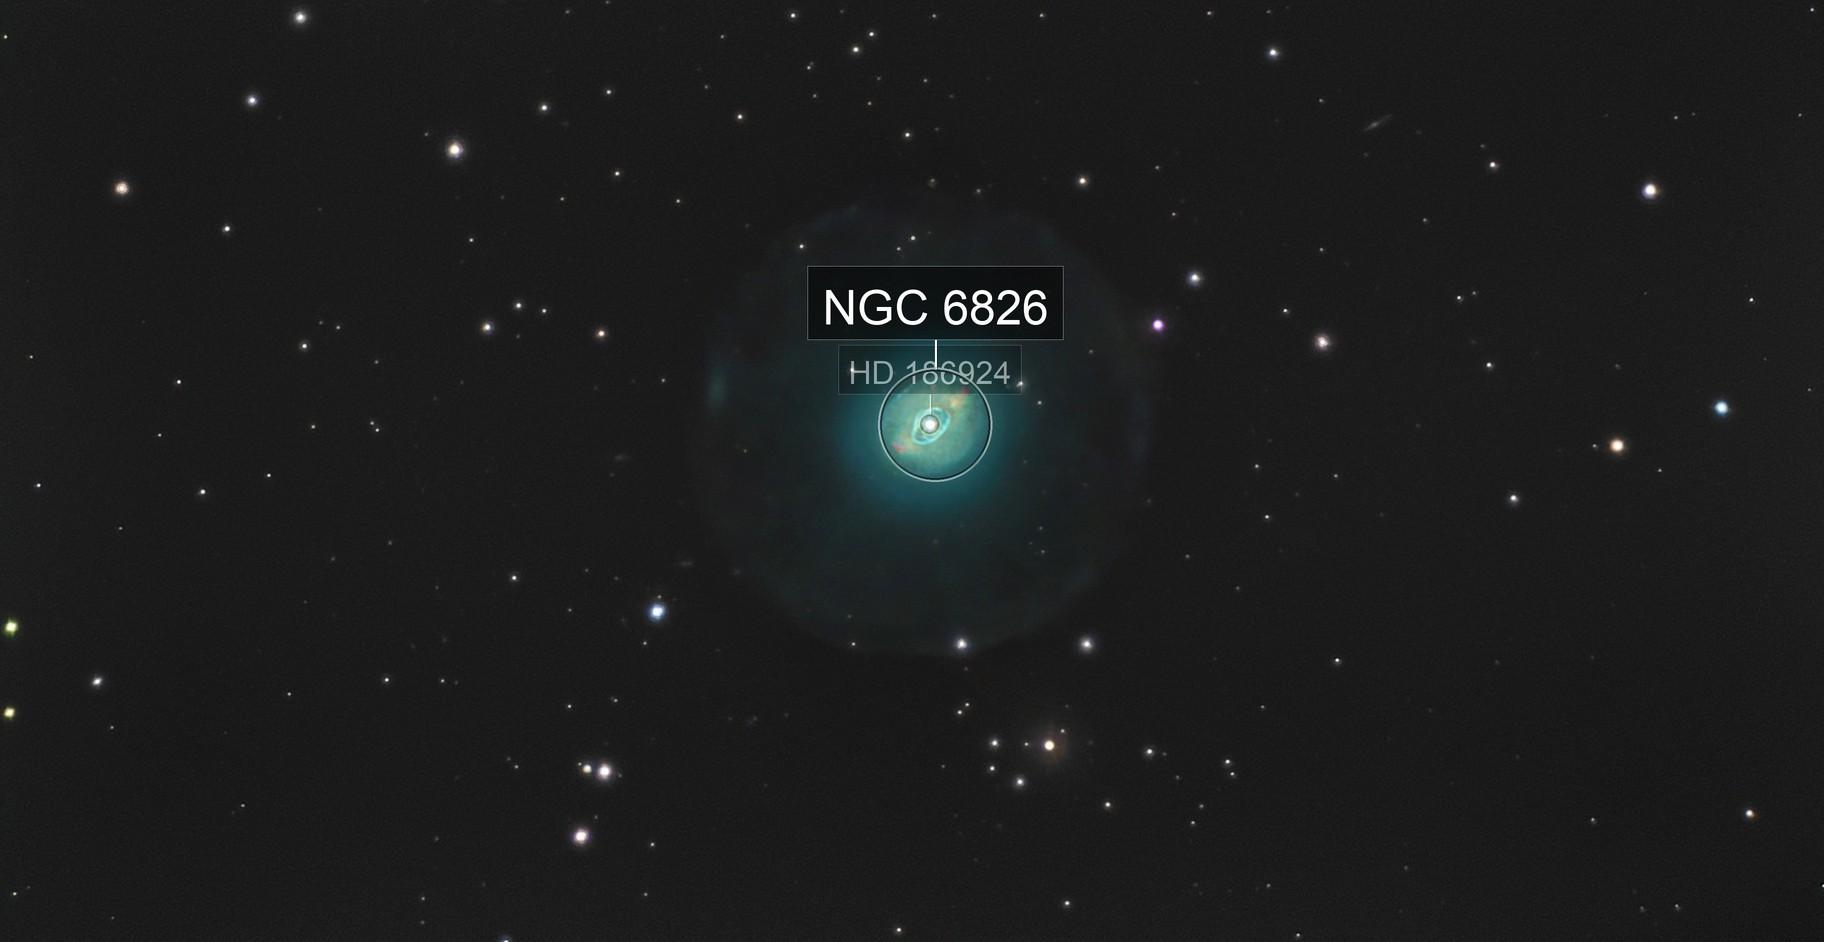 ngc 6826 planetary nebula